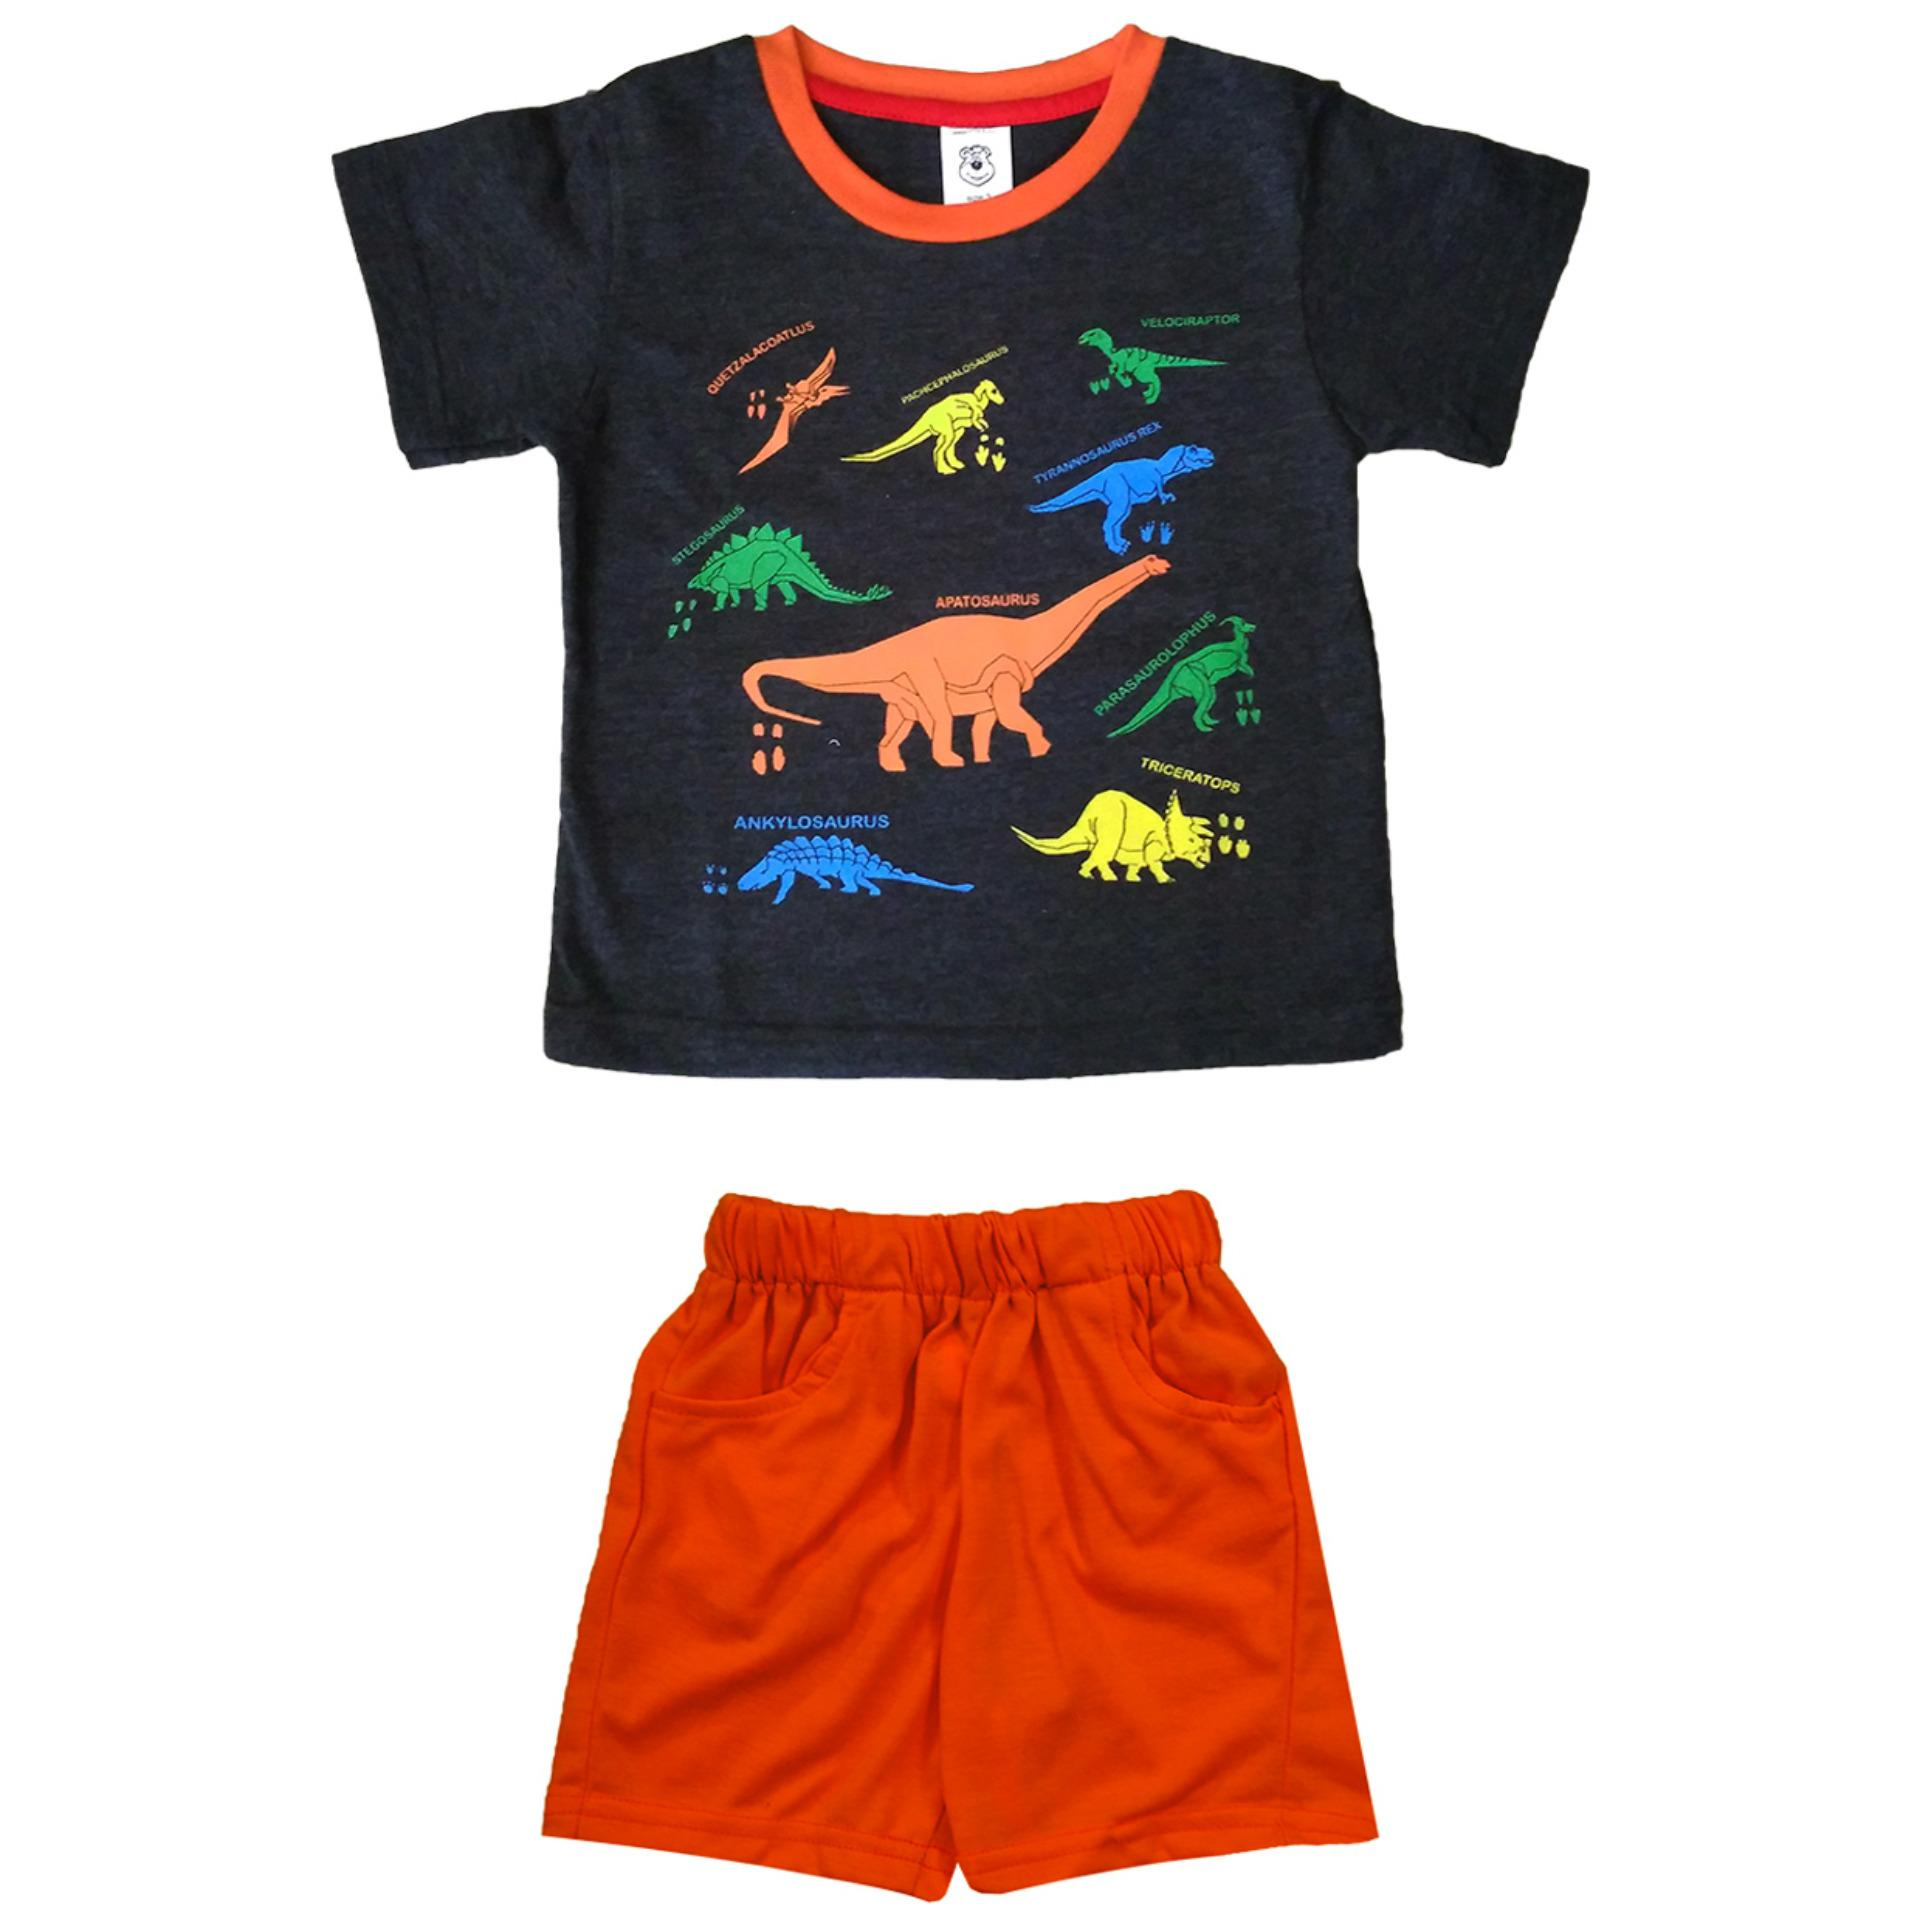 Satu Set Pakaian Bayi Anak Cewek Cowok Kaos Celana Singlet Baju Pendek Source Macbear Kids